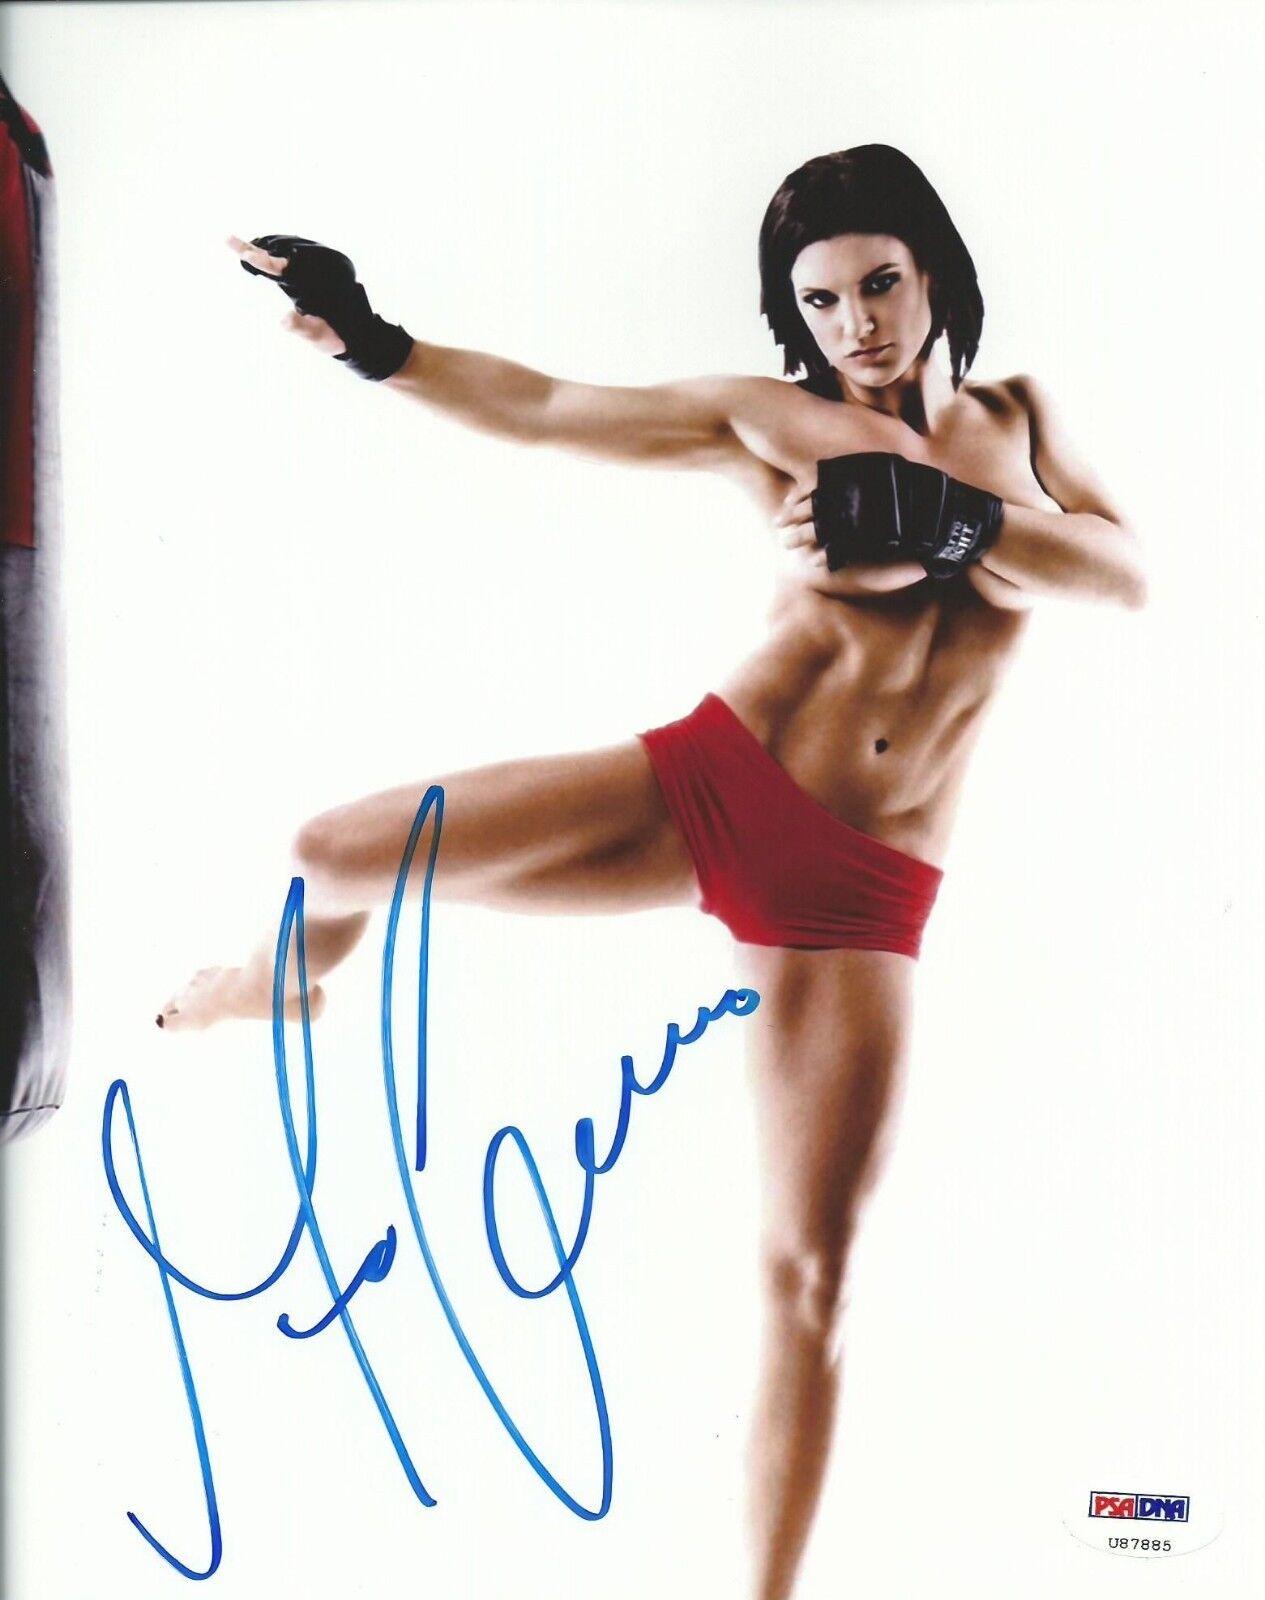 Gina Carano Firmado UFC 8x10 Foto PSA DNA COA Autógrafo Espn Deportes Topless